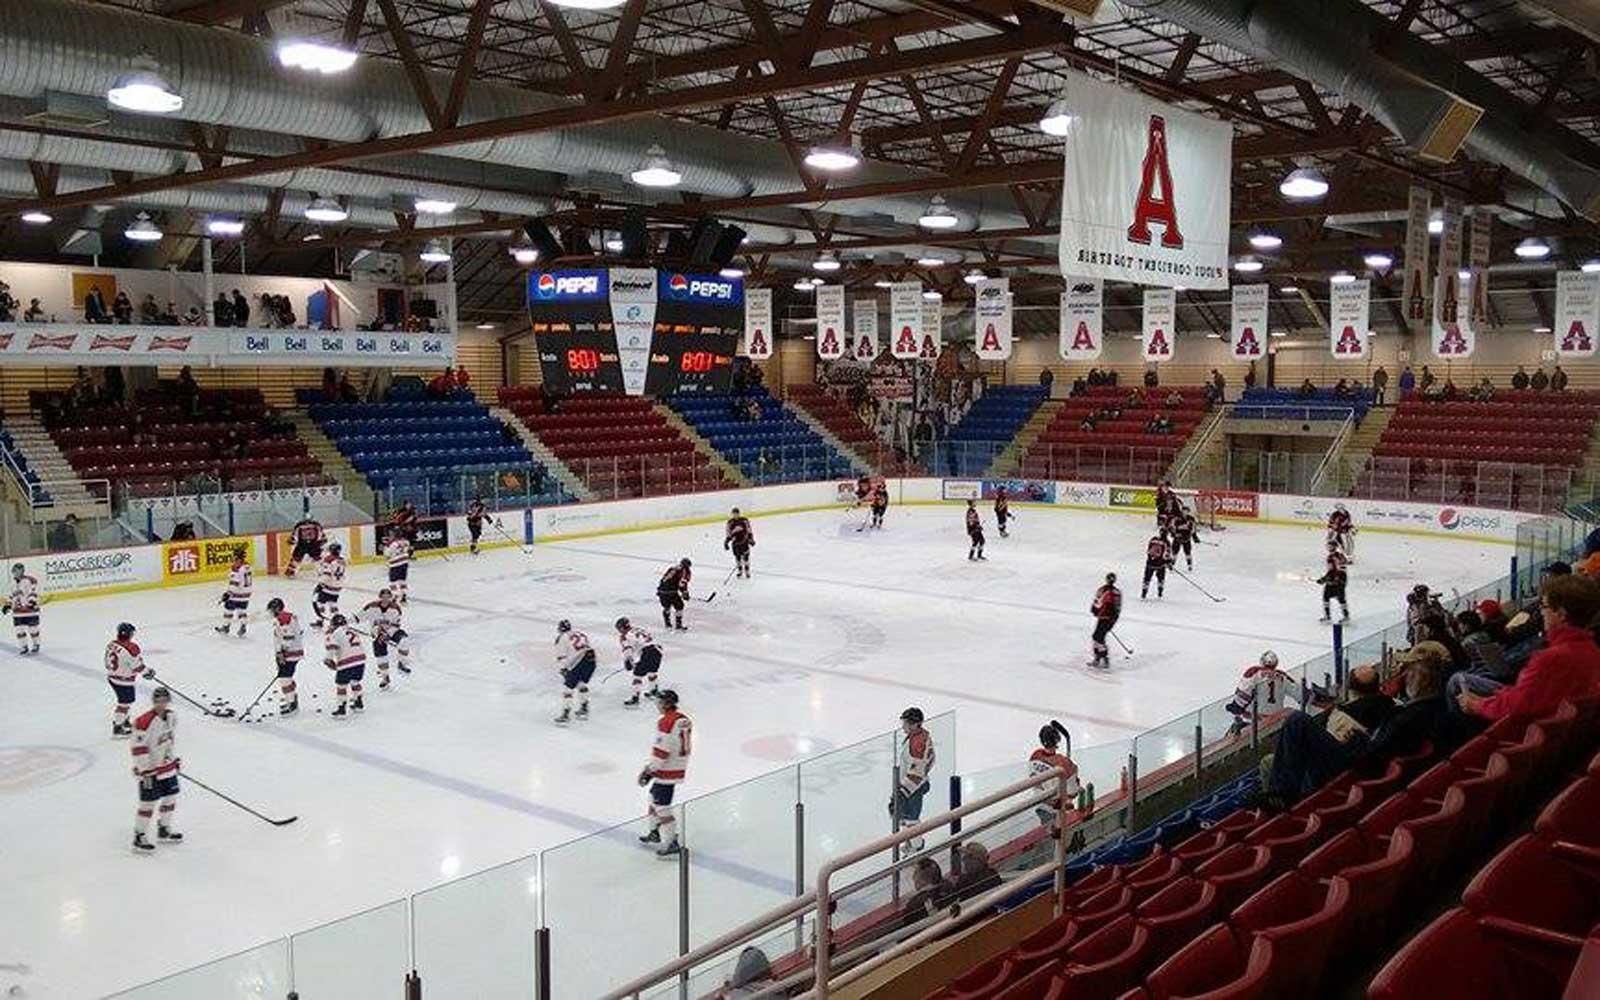 Eishockeyspiel in Kanada